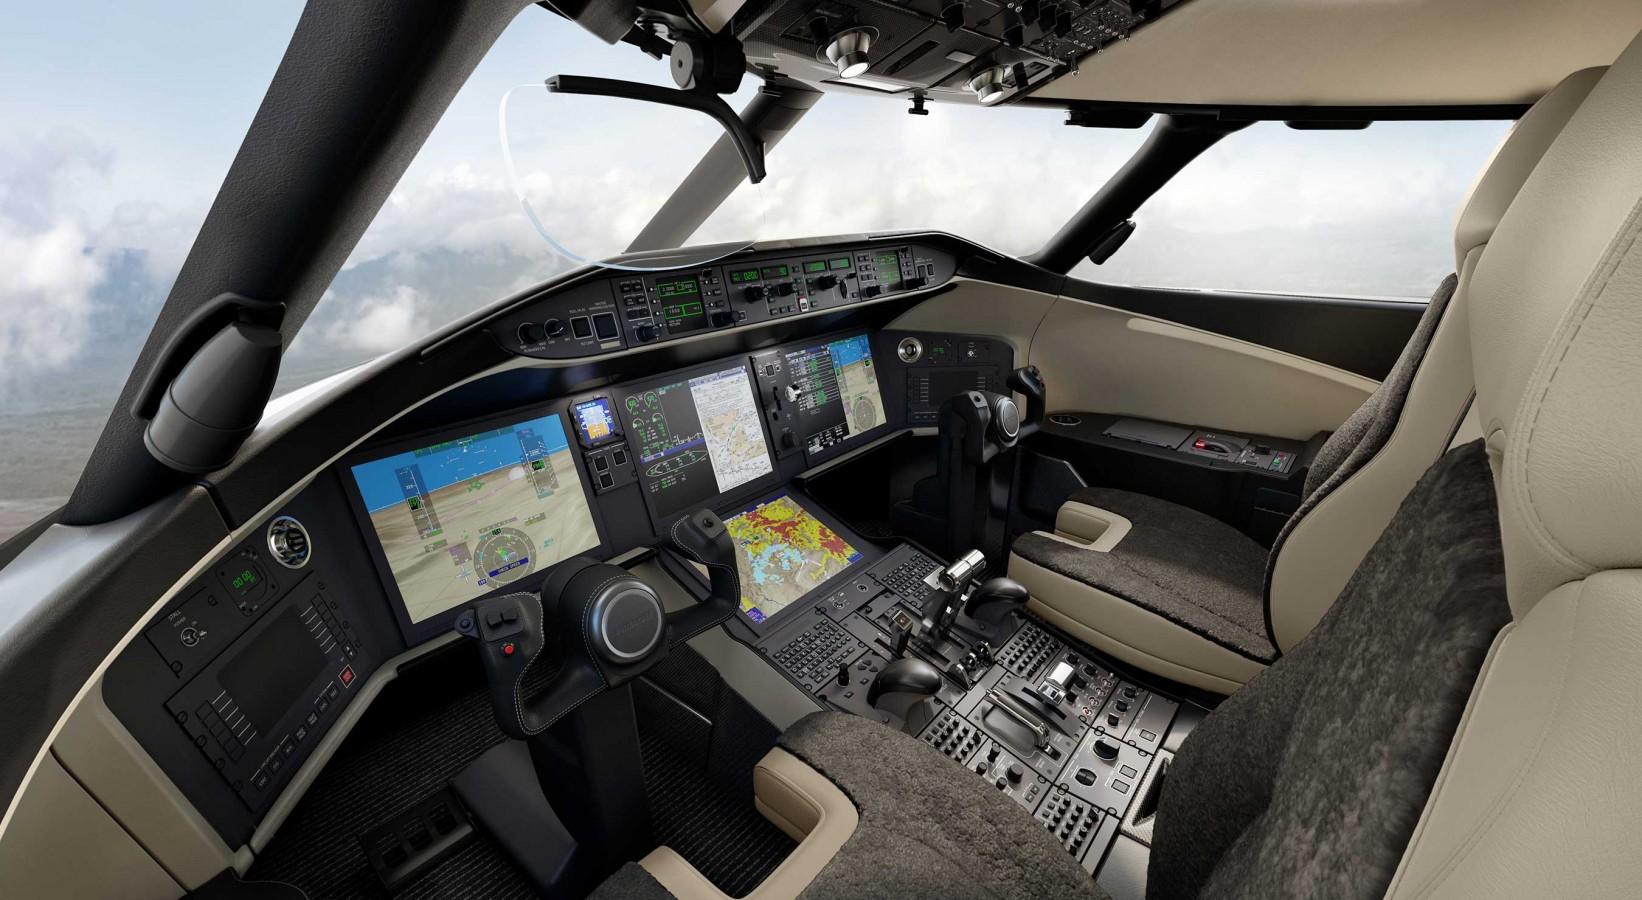 Global 5500 - Bombardier vision flight deck